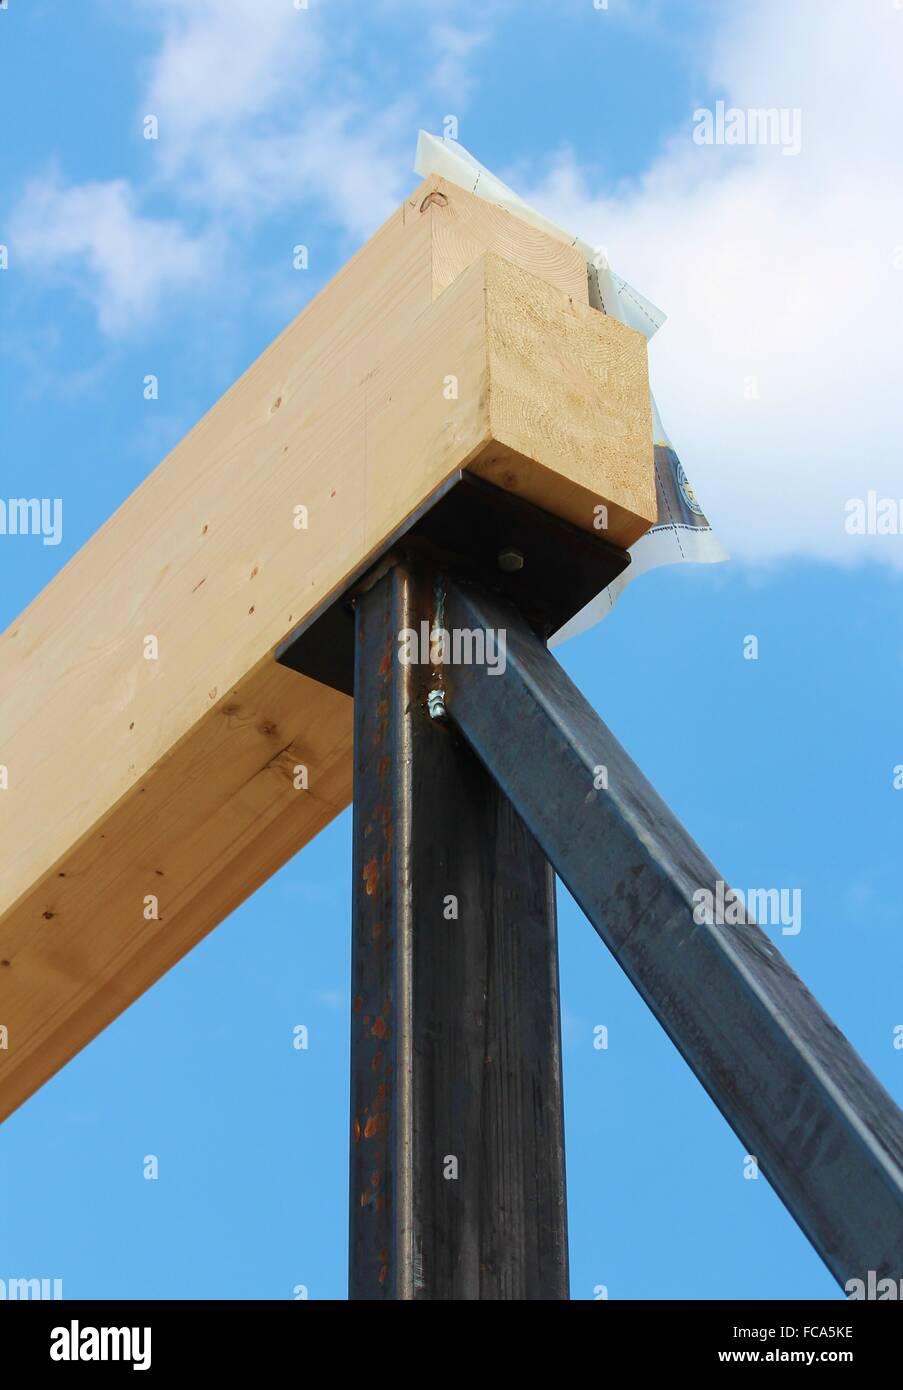 Holzbau-detail Stockfoto